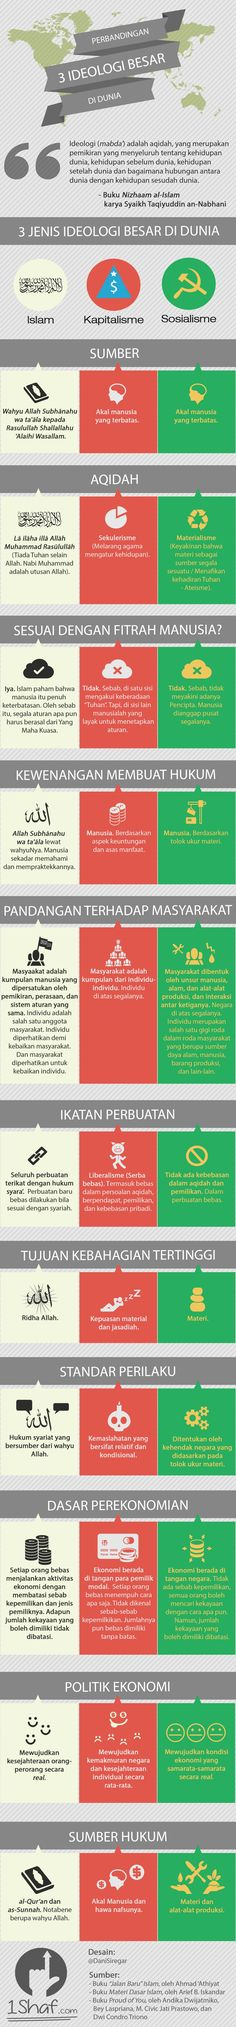 Tabel Perbandingan 3 Ideologi: Islam, Kapitalisme, dan Sosialisme